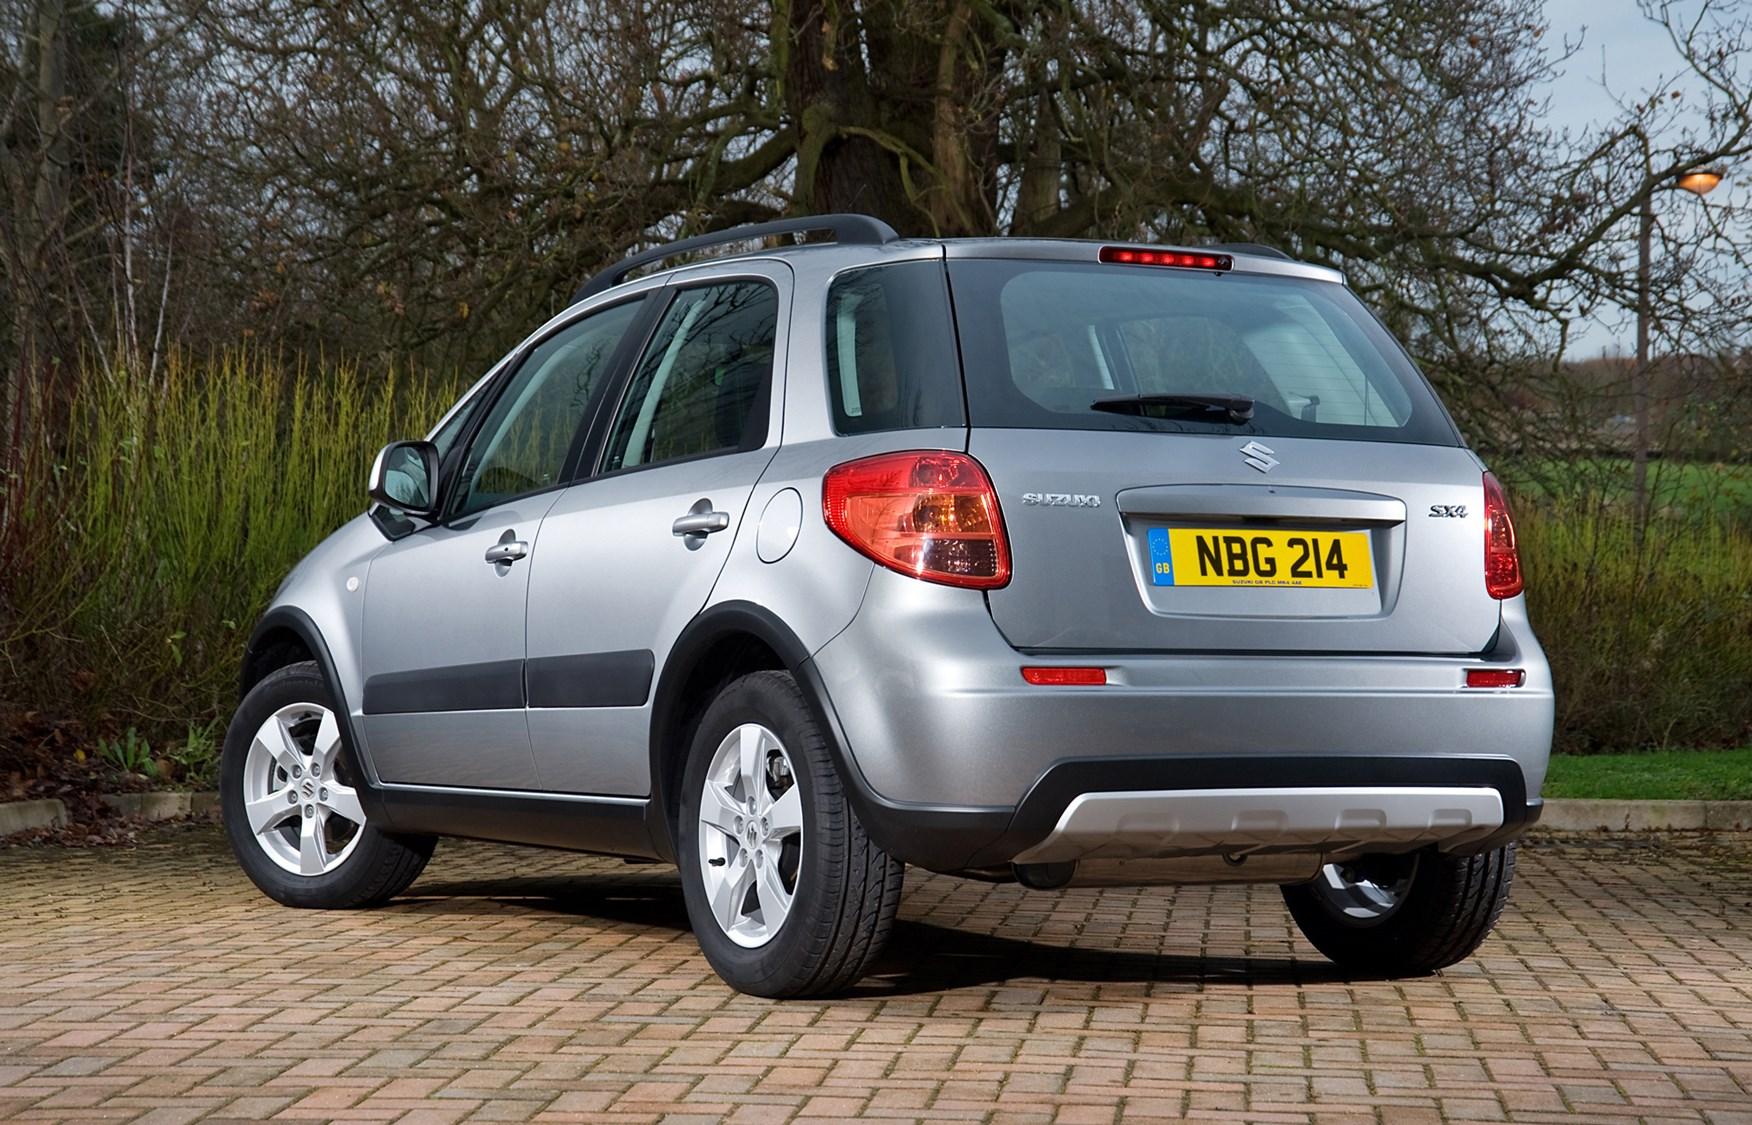 Used Subaru Impreza Hatchback >> Used Suzuki SX4 Hatchback (2006 - 2014) Review | Parkers